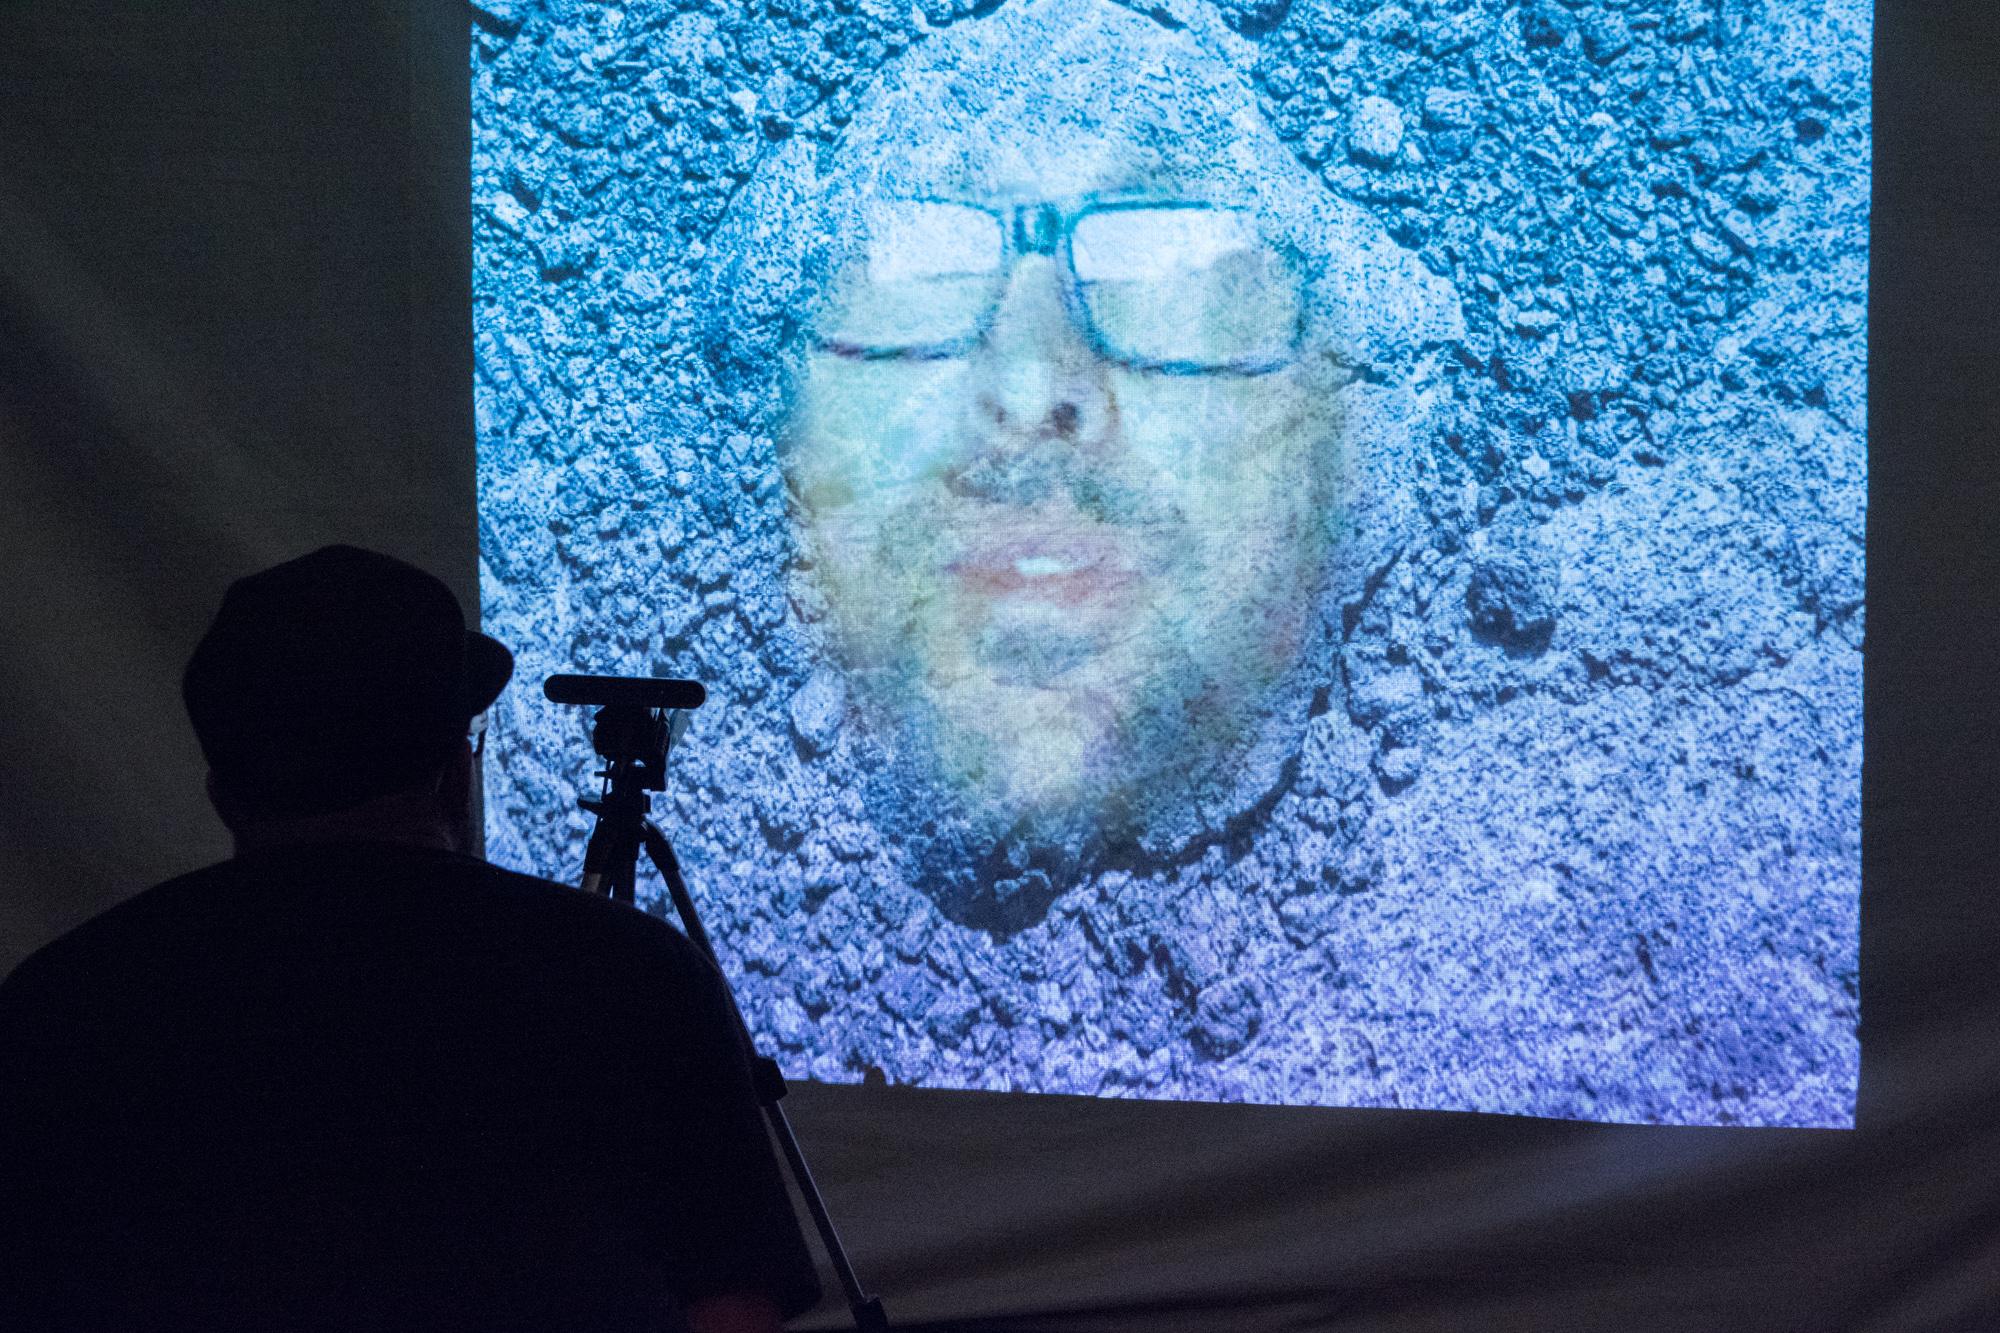 Laura Lee Coles & Rob Scharein - Earth Face. Ash Tanasiychuk photo.